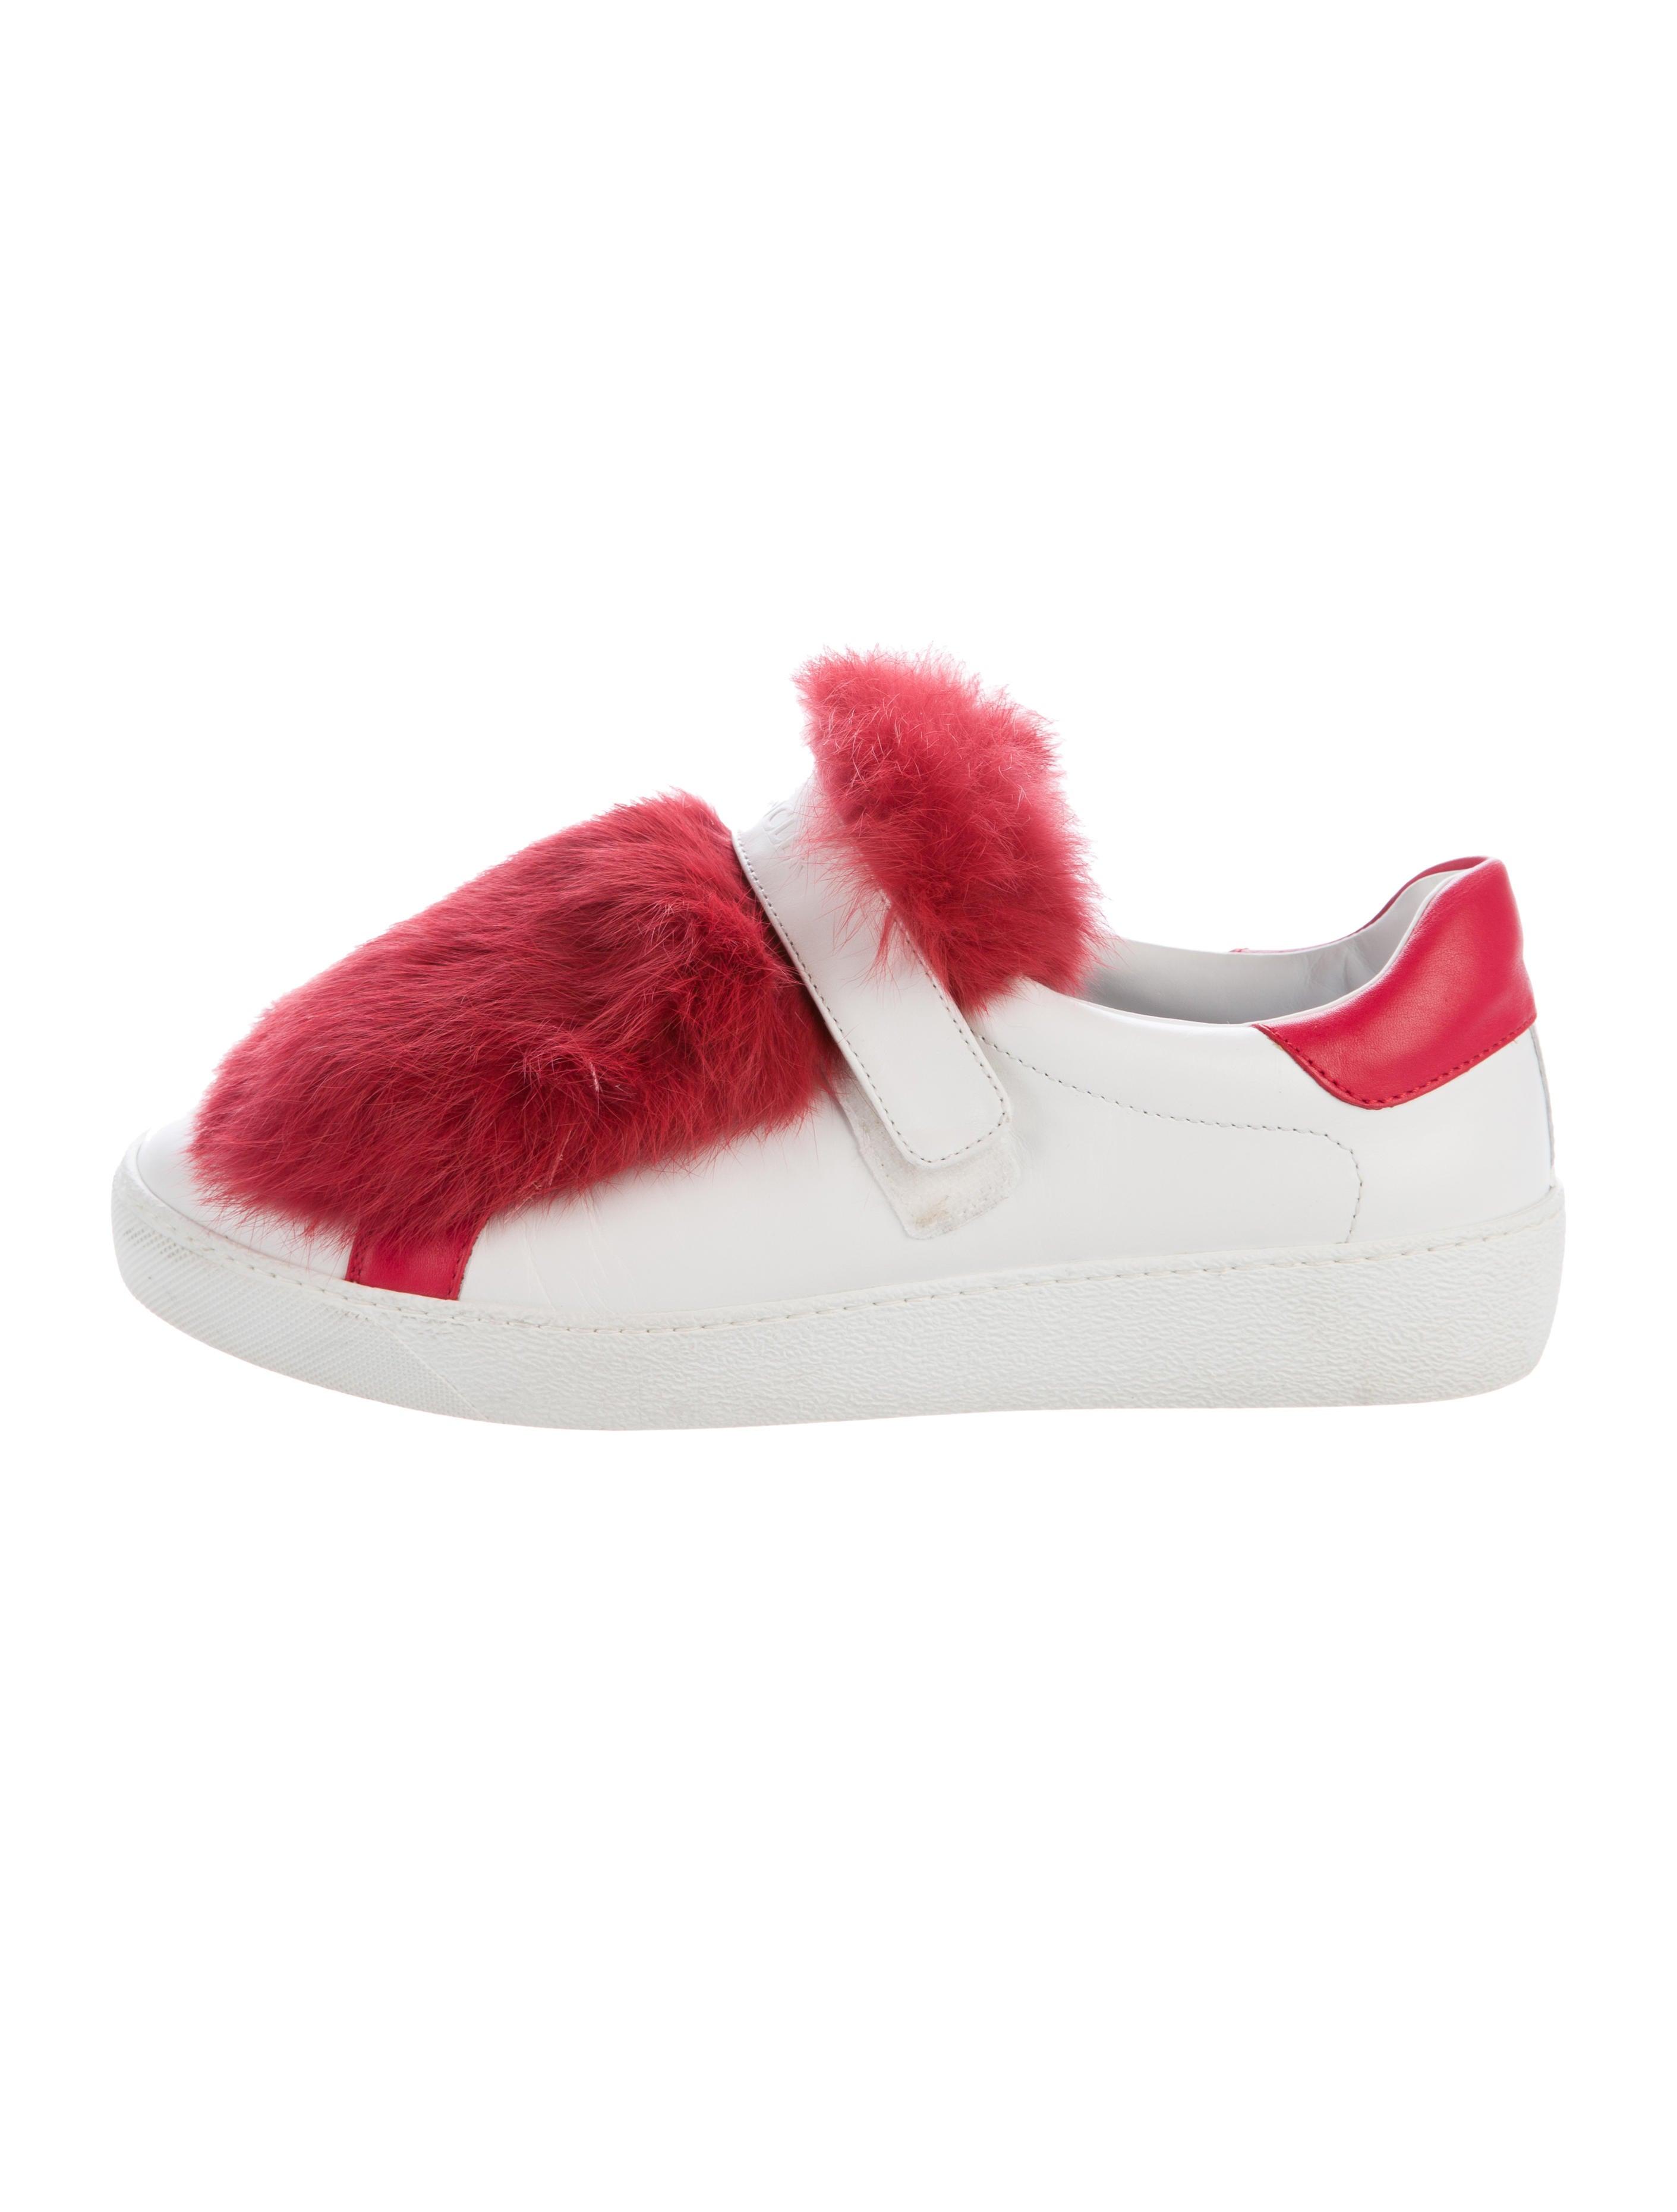 fe661f90a1dc Moncler Fur-Trimmed Low-Top Sneakers - Shoes - MOC24155